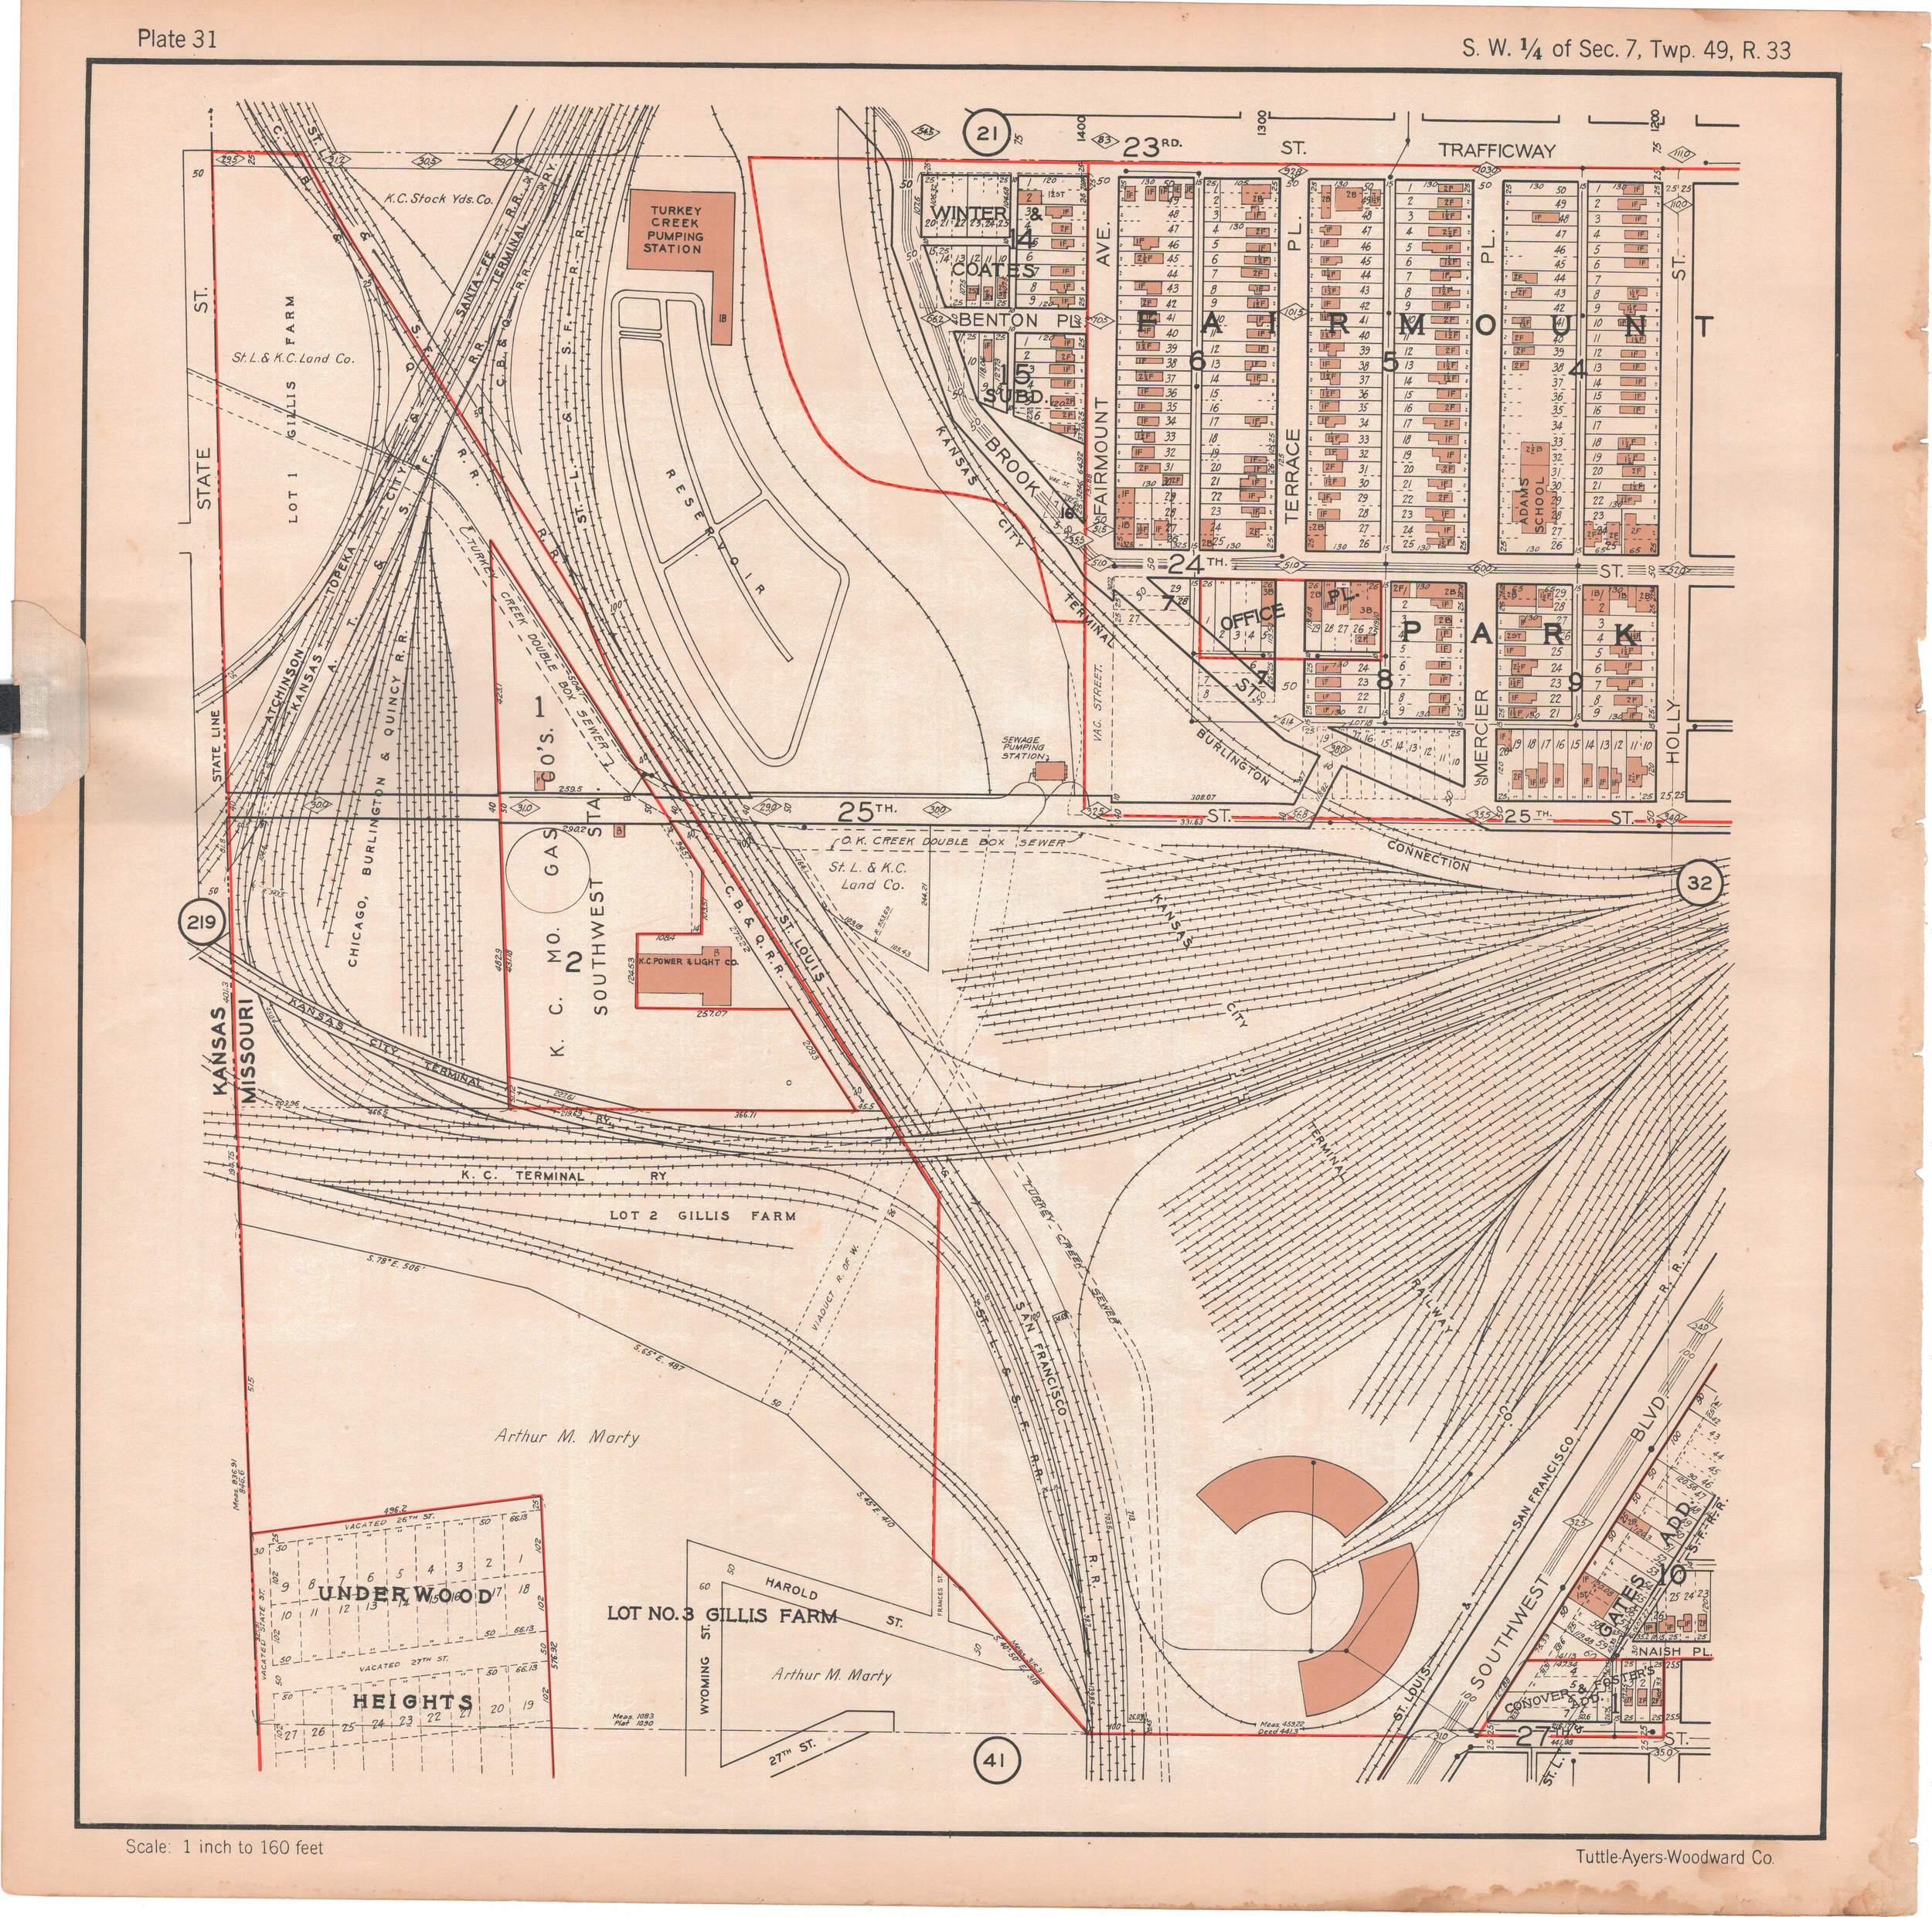 1925 TUTTLE_AYERS_Plate 31.JPG